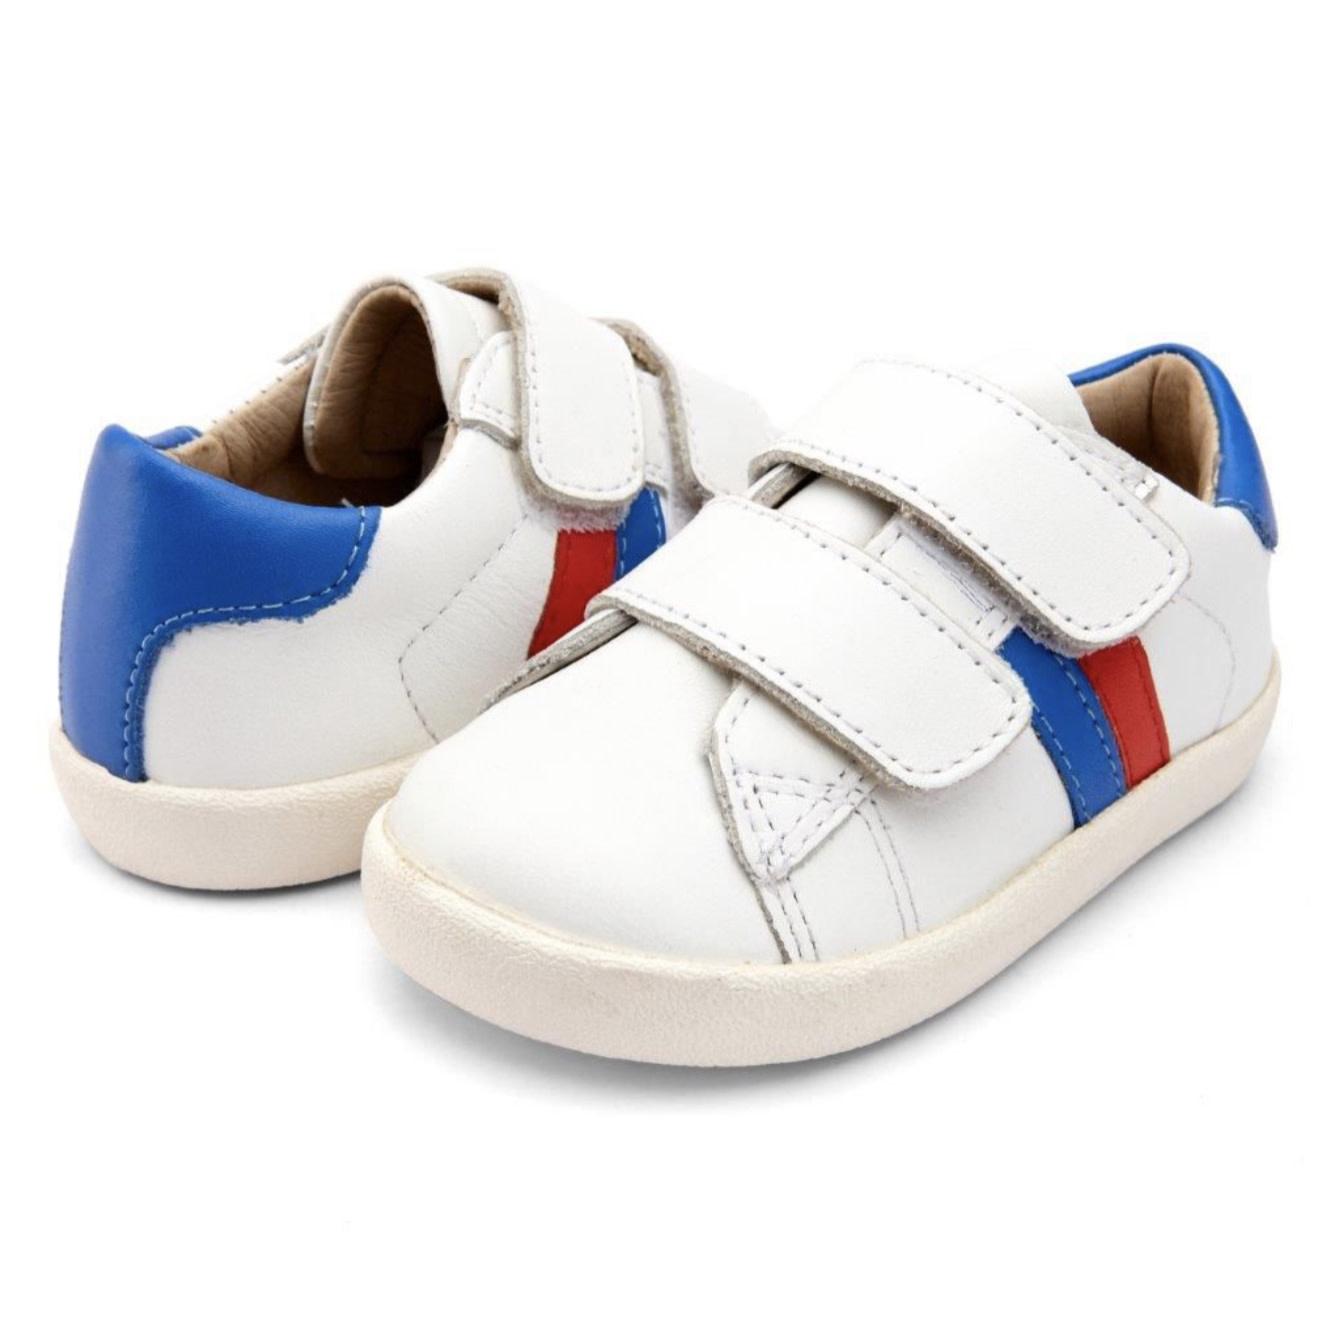 OLD SOLES Toody Sport